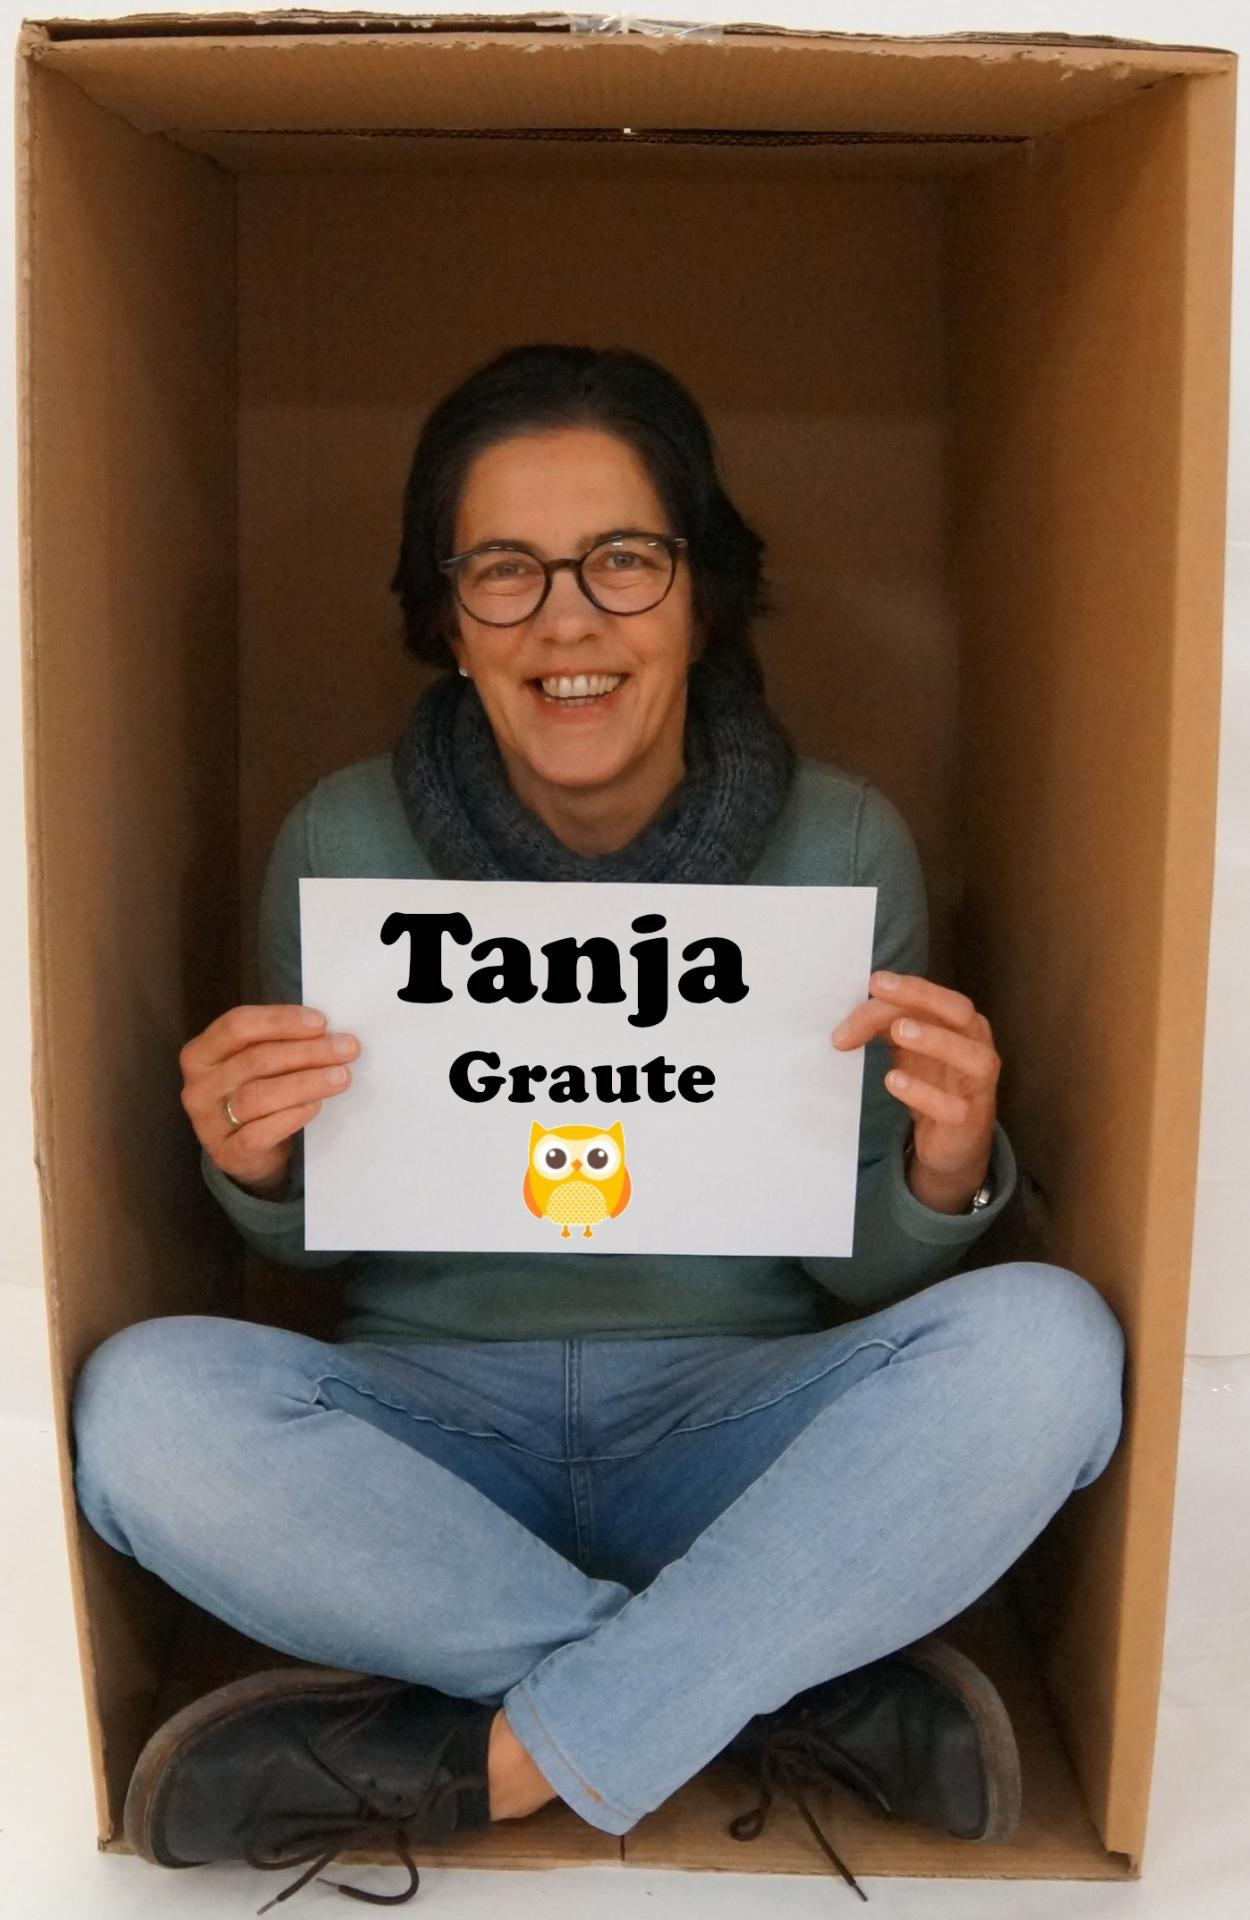 Tanja Graute